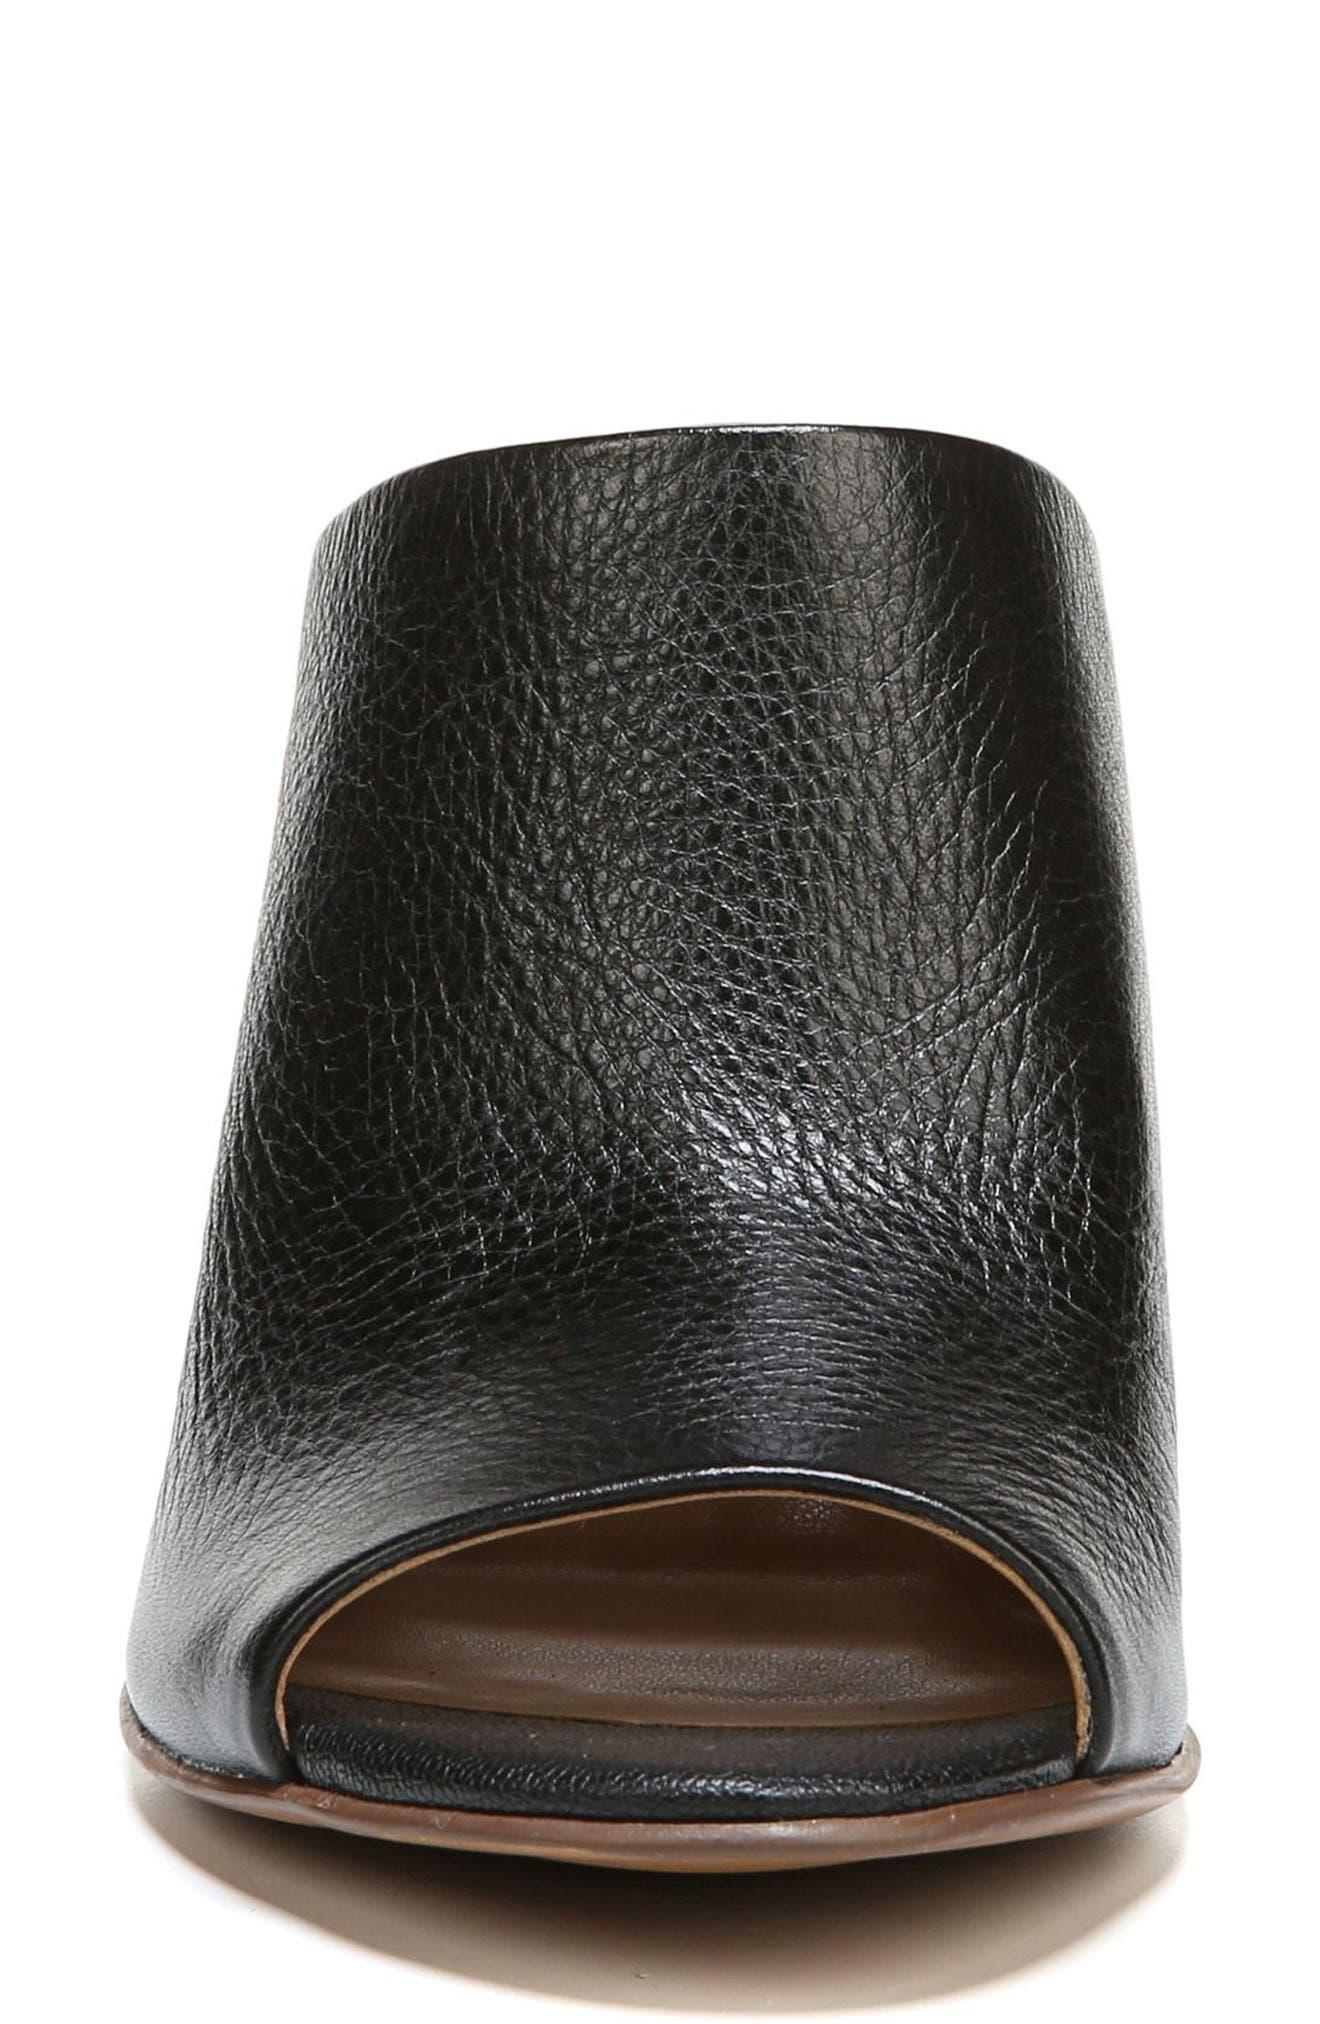 Sloan Sandal,                             Alternate thumbnail 4, color,                             Black Pebbled Leather